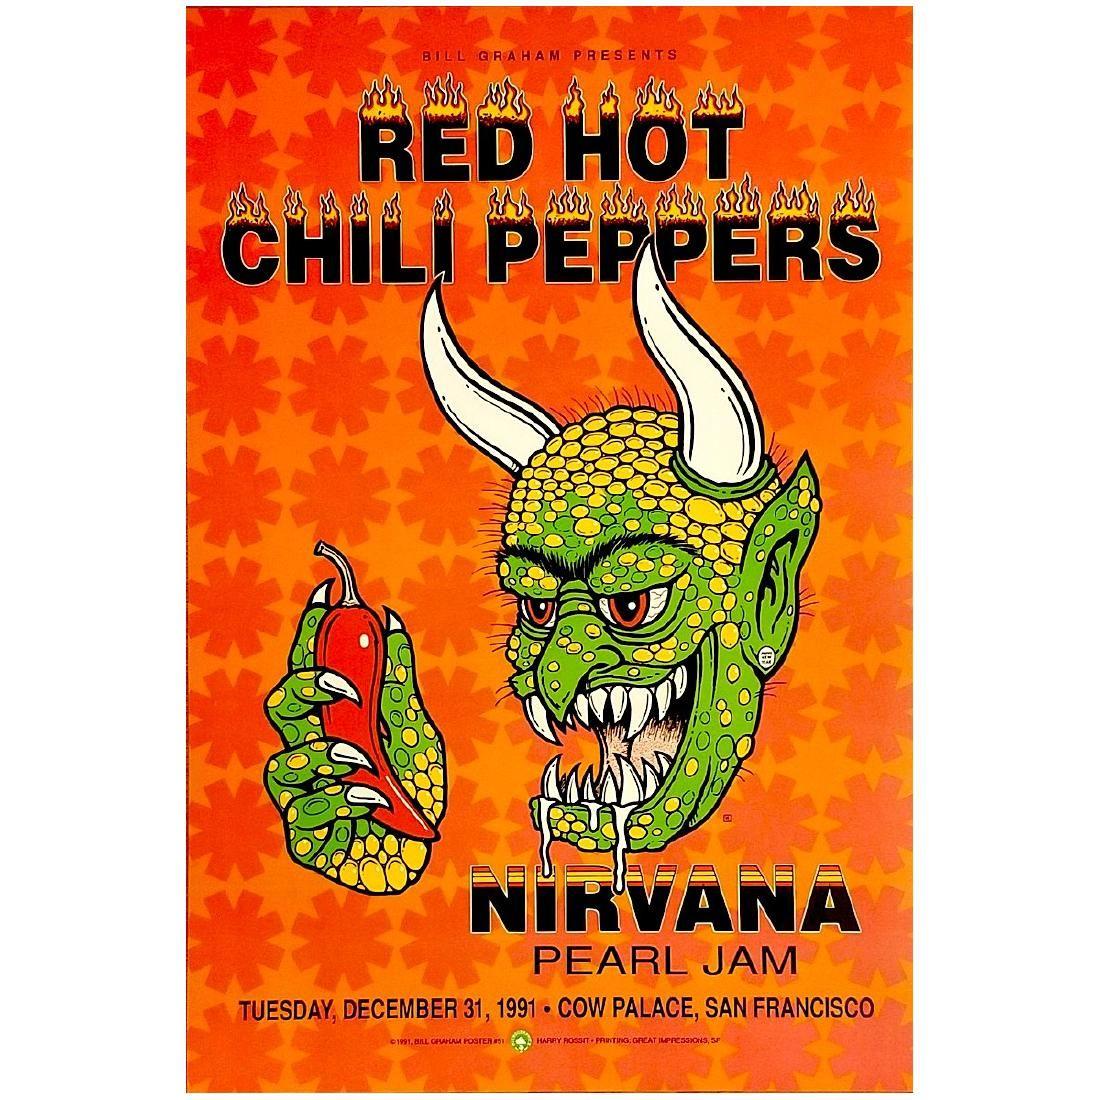 Nirvana - RHCP - Pearl Jam - 1991 Concert Poster